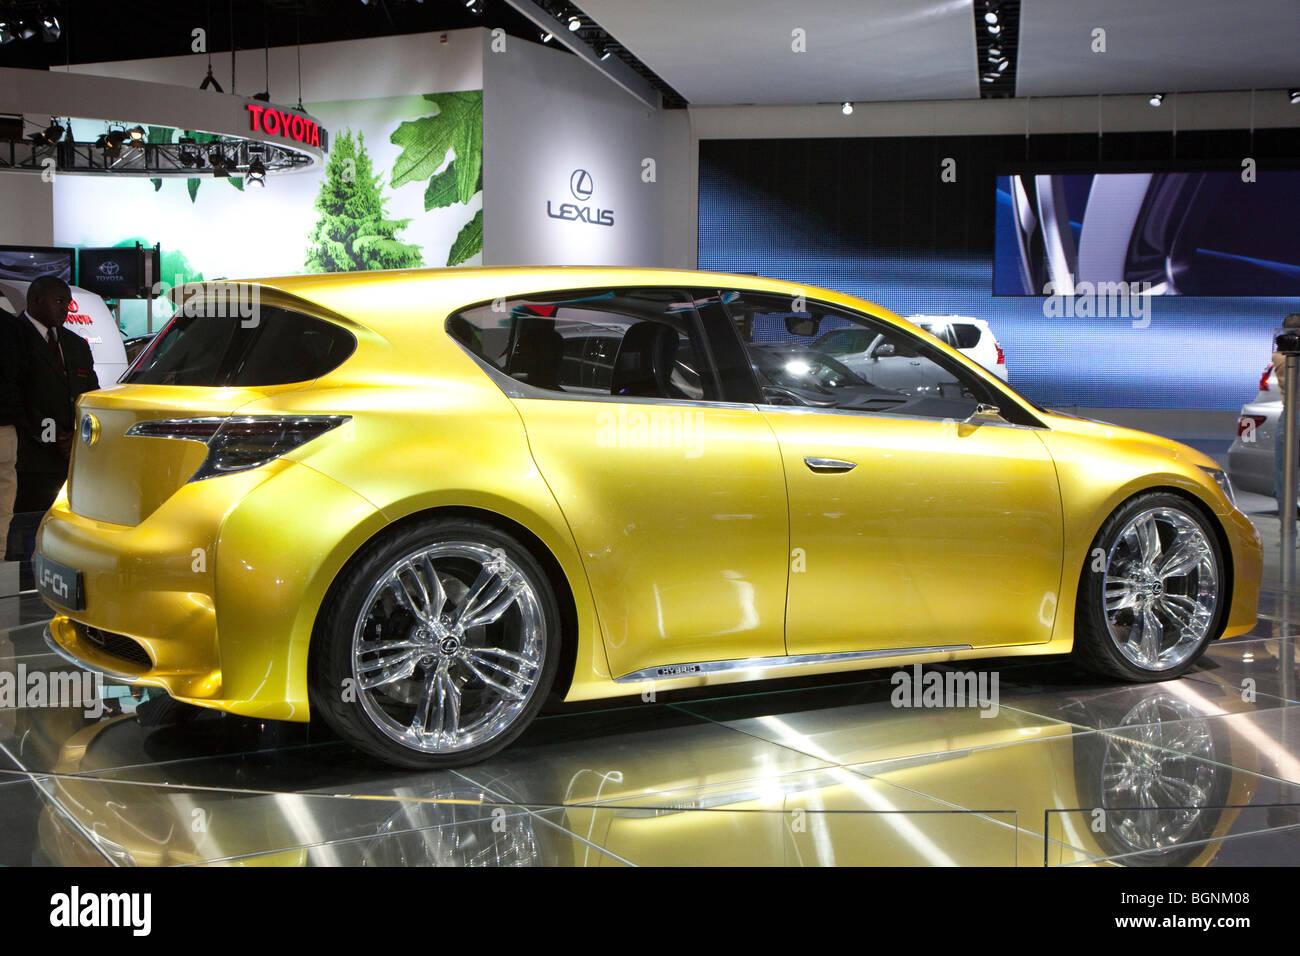 http://c8.alamy.com/comp/BGNM08/detroit-michigan-the-lexus-lf-ch-hybrid-concept-car-on-display-at-BGNM08.jpg